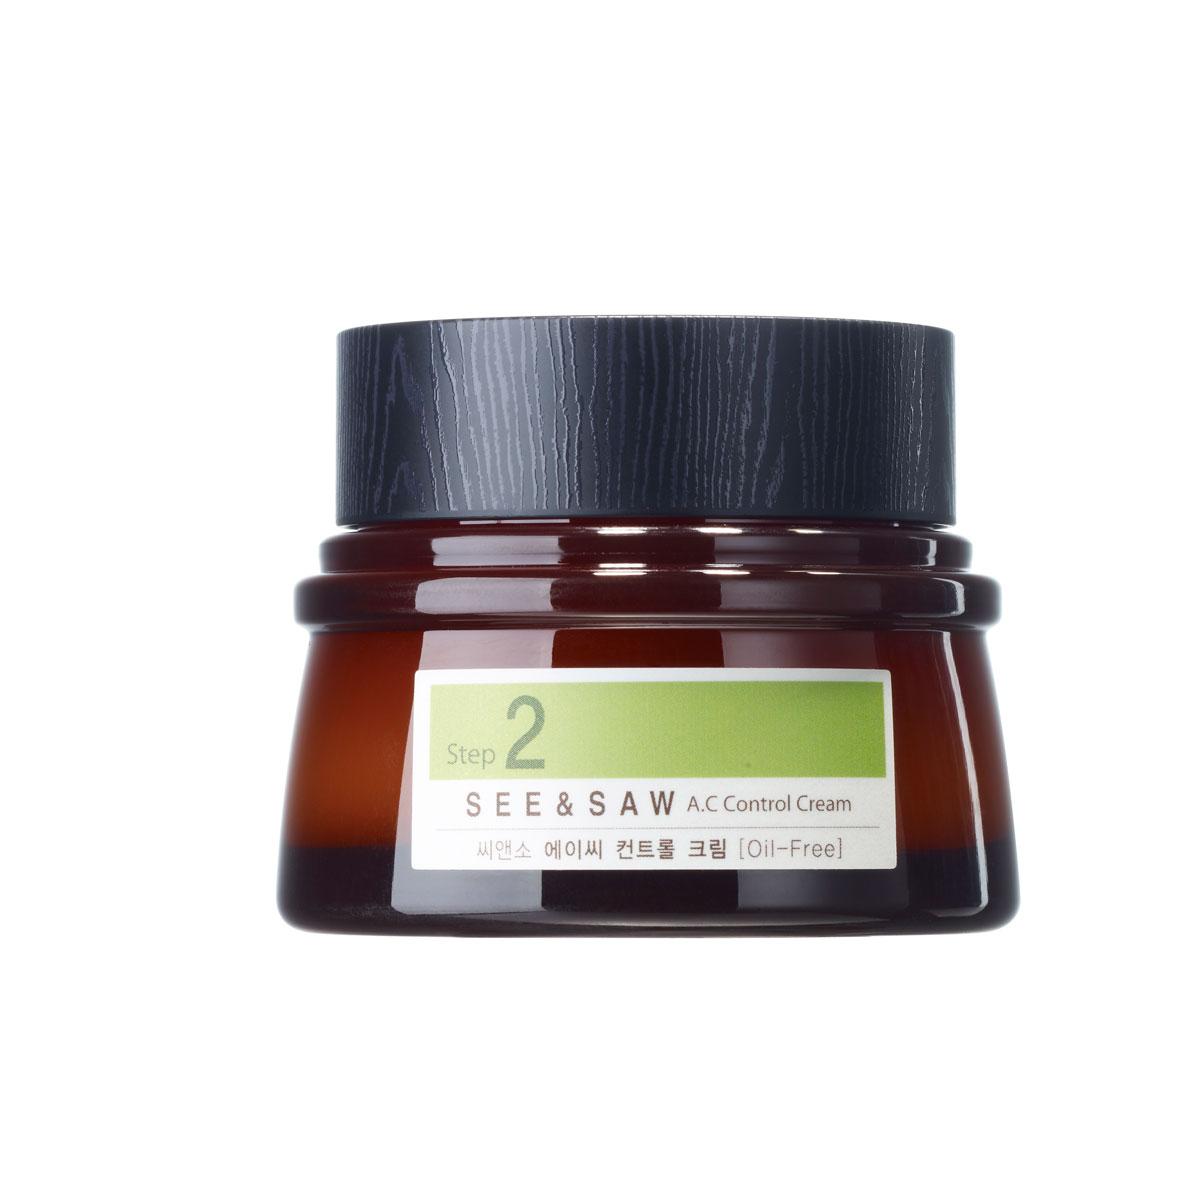 The Saem Крем для контроля чистоты и жирности кожи See  Saw A.C Control Cream, 50 мл